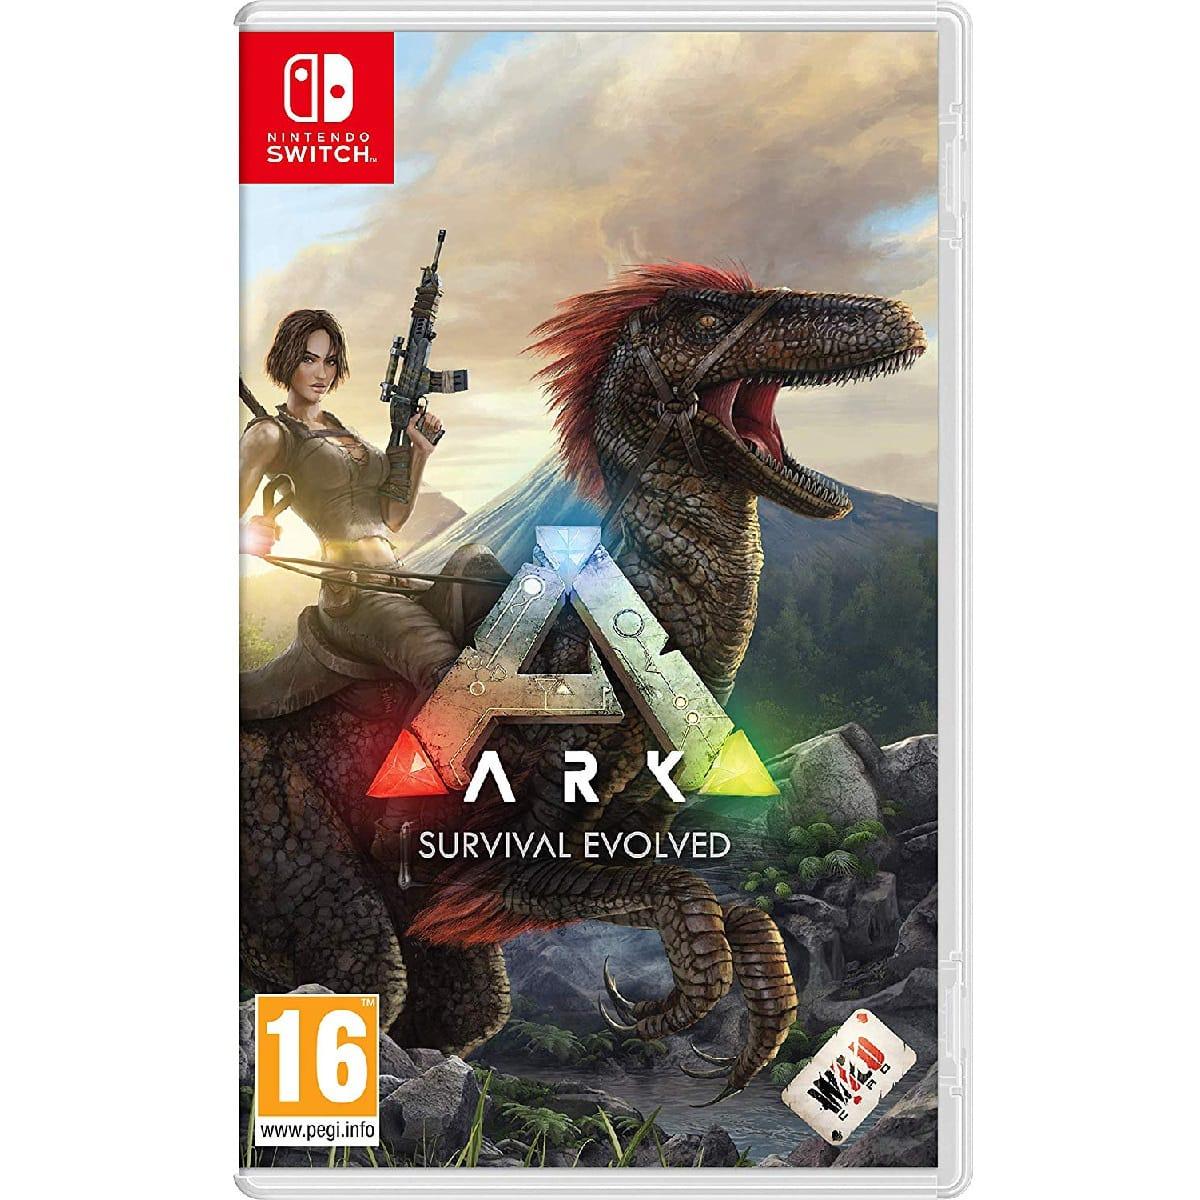 Jeu Ark Survival : Evolved sur Nintendo Switch